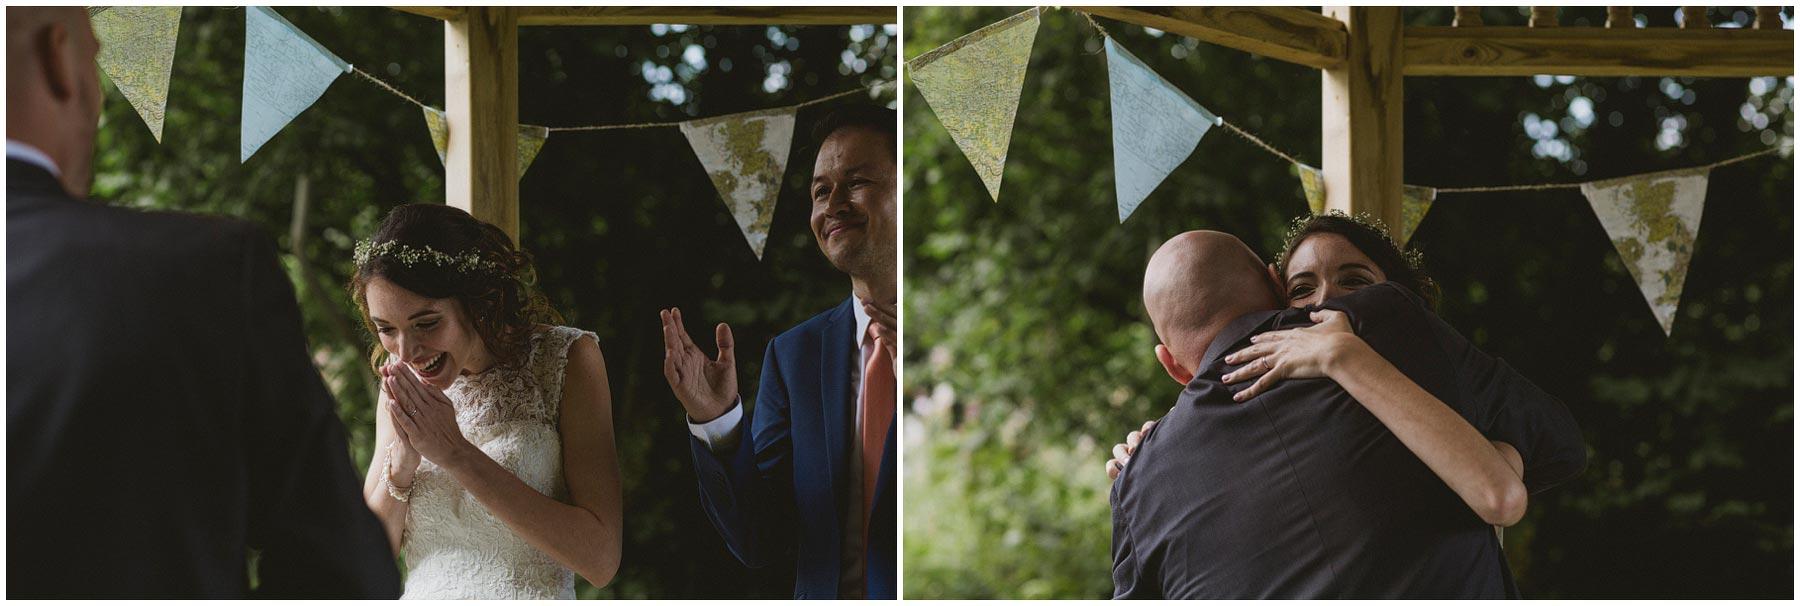 Colehayes-Park-Wedding-Photography_0087